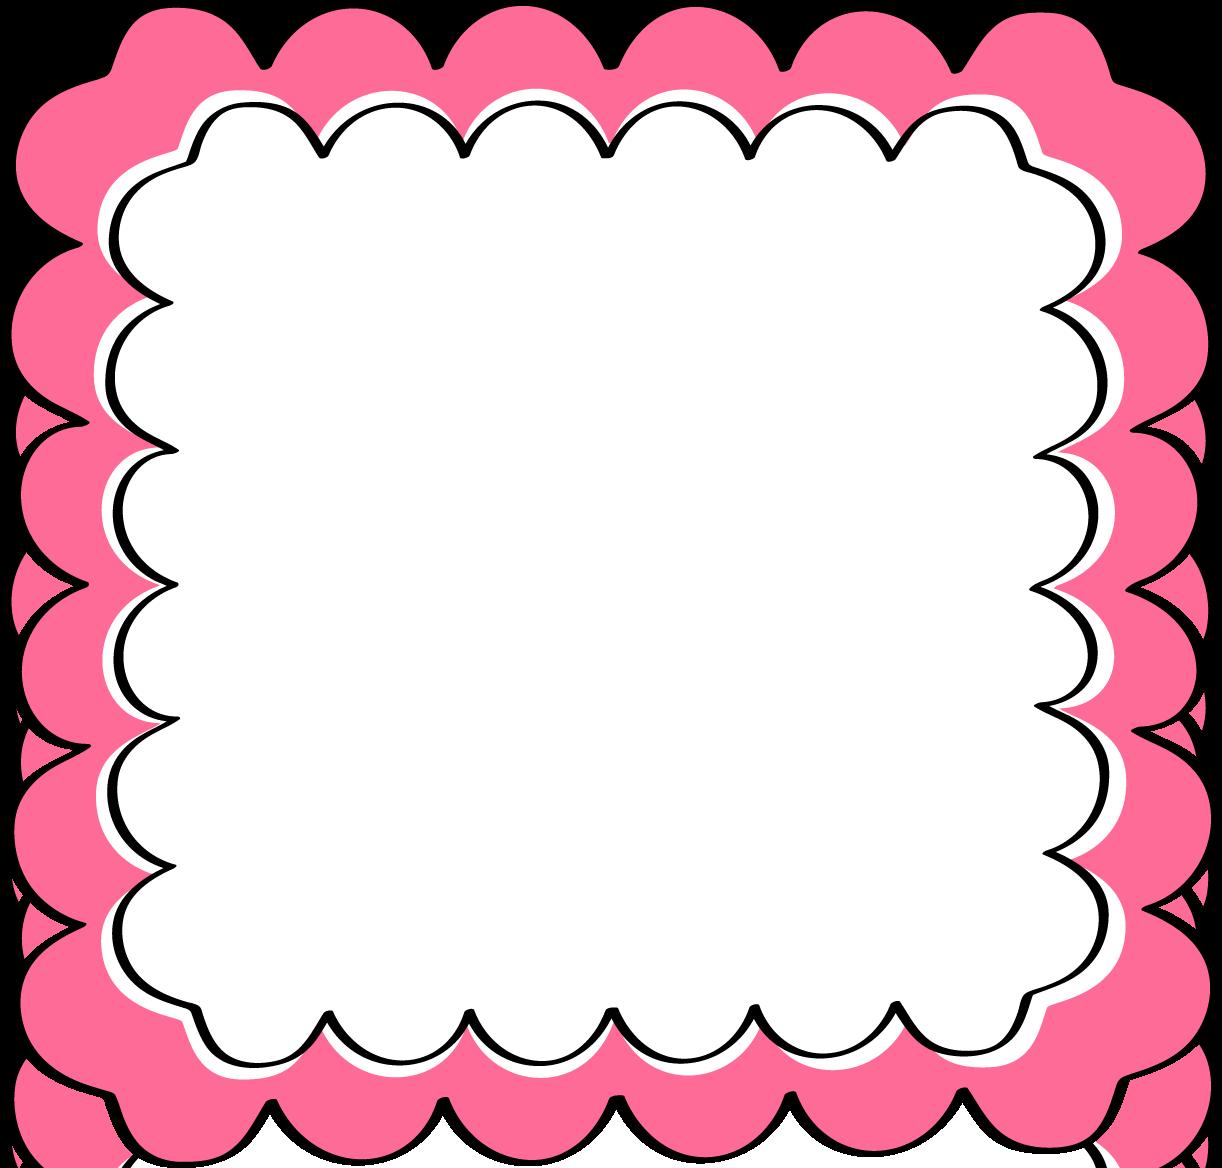 Scalloped Round Frame Clipart I2clipart Royalty Free Public Domain Clipart Cake Frame Frame Clipart Frame Logo